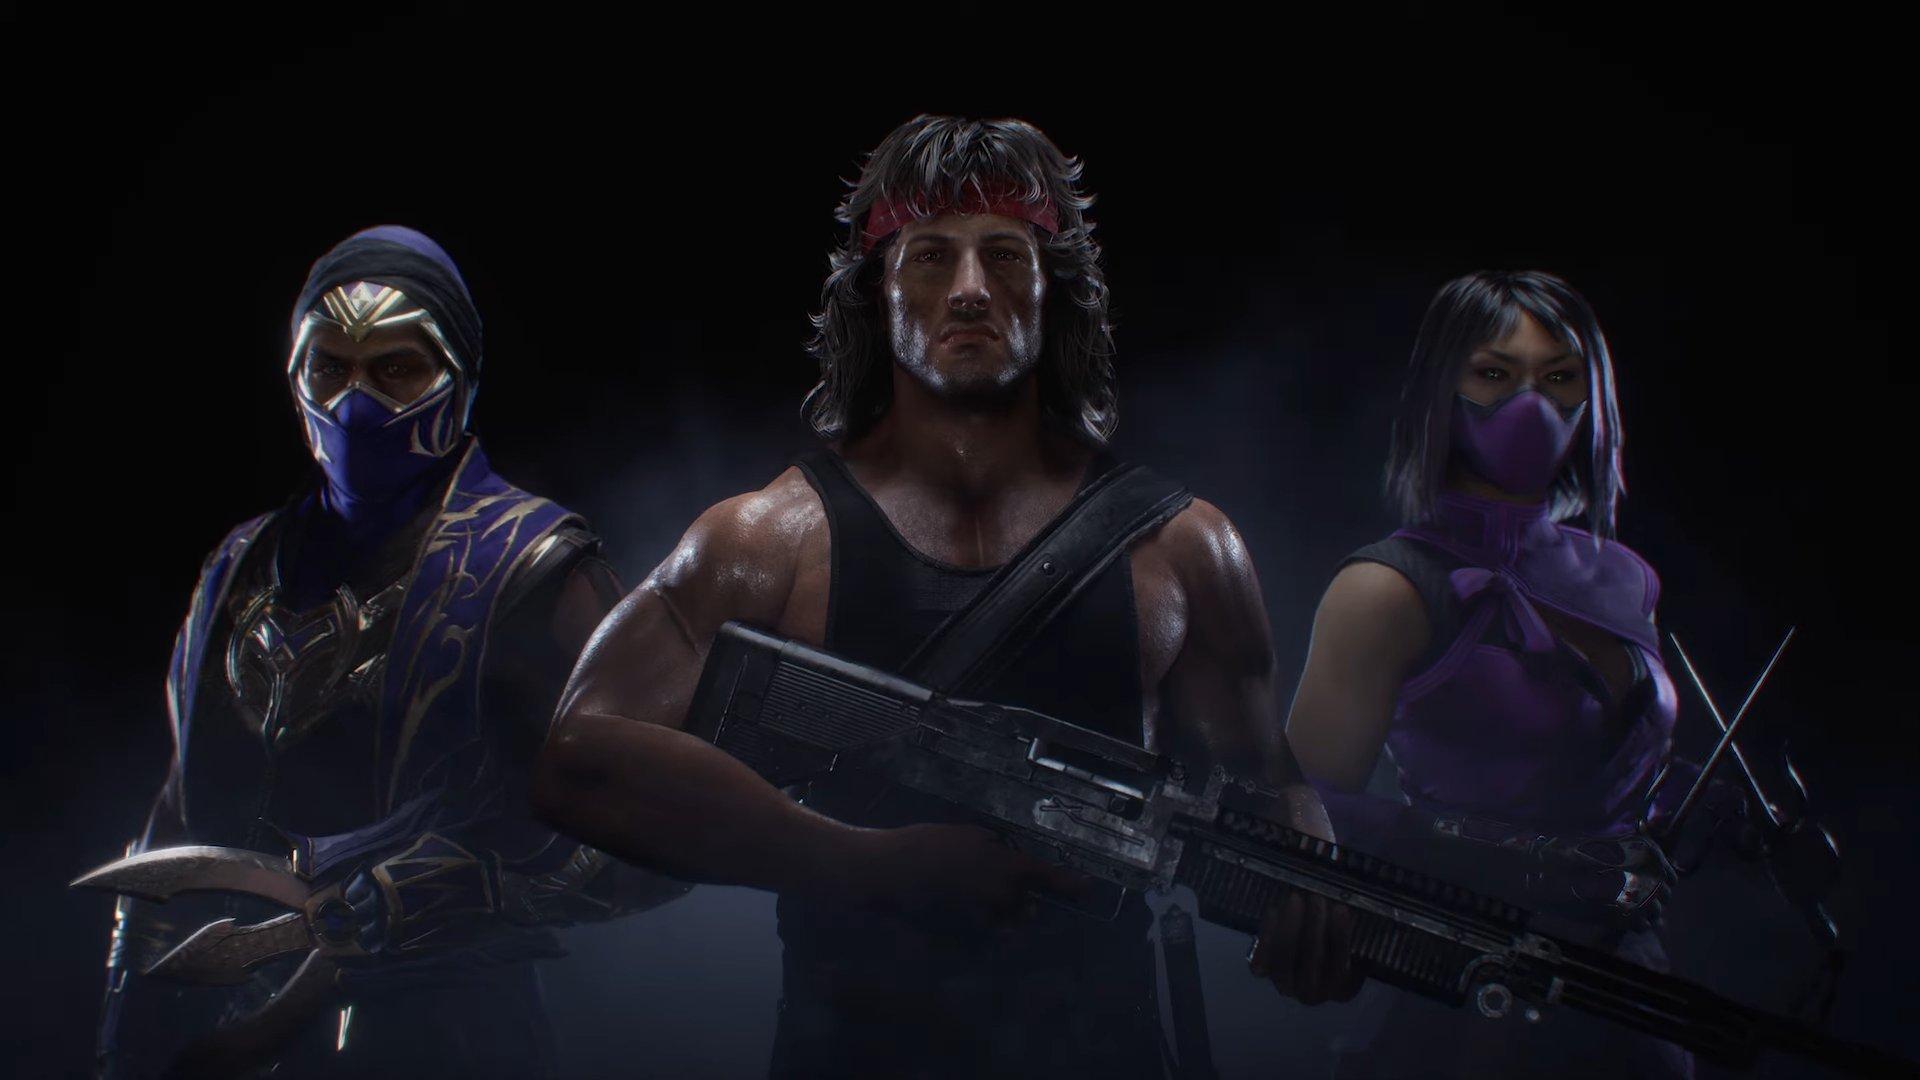 Mortal Kombat Online - Mortal Kombat X - Better face in